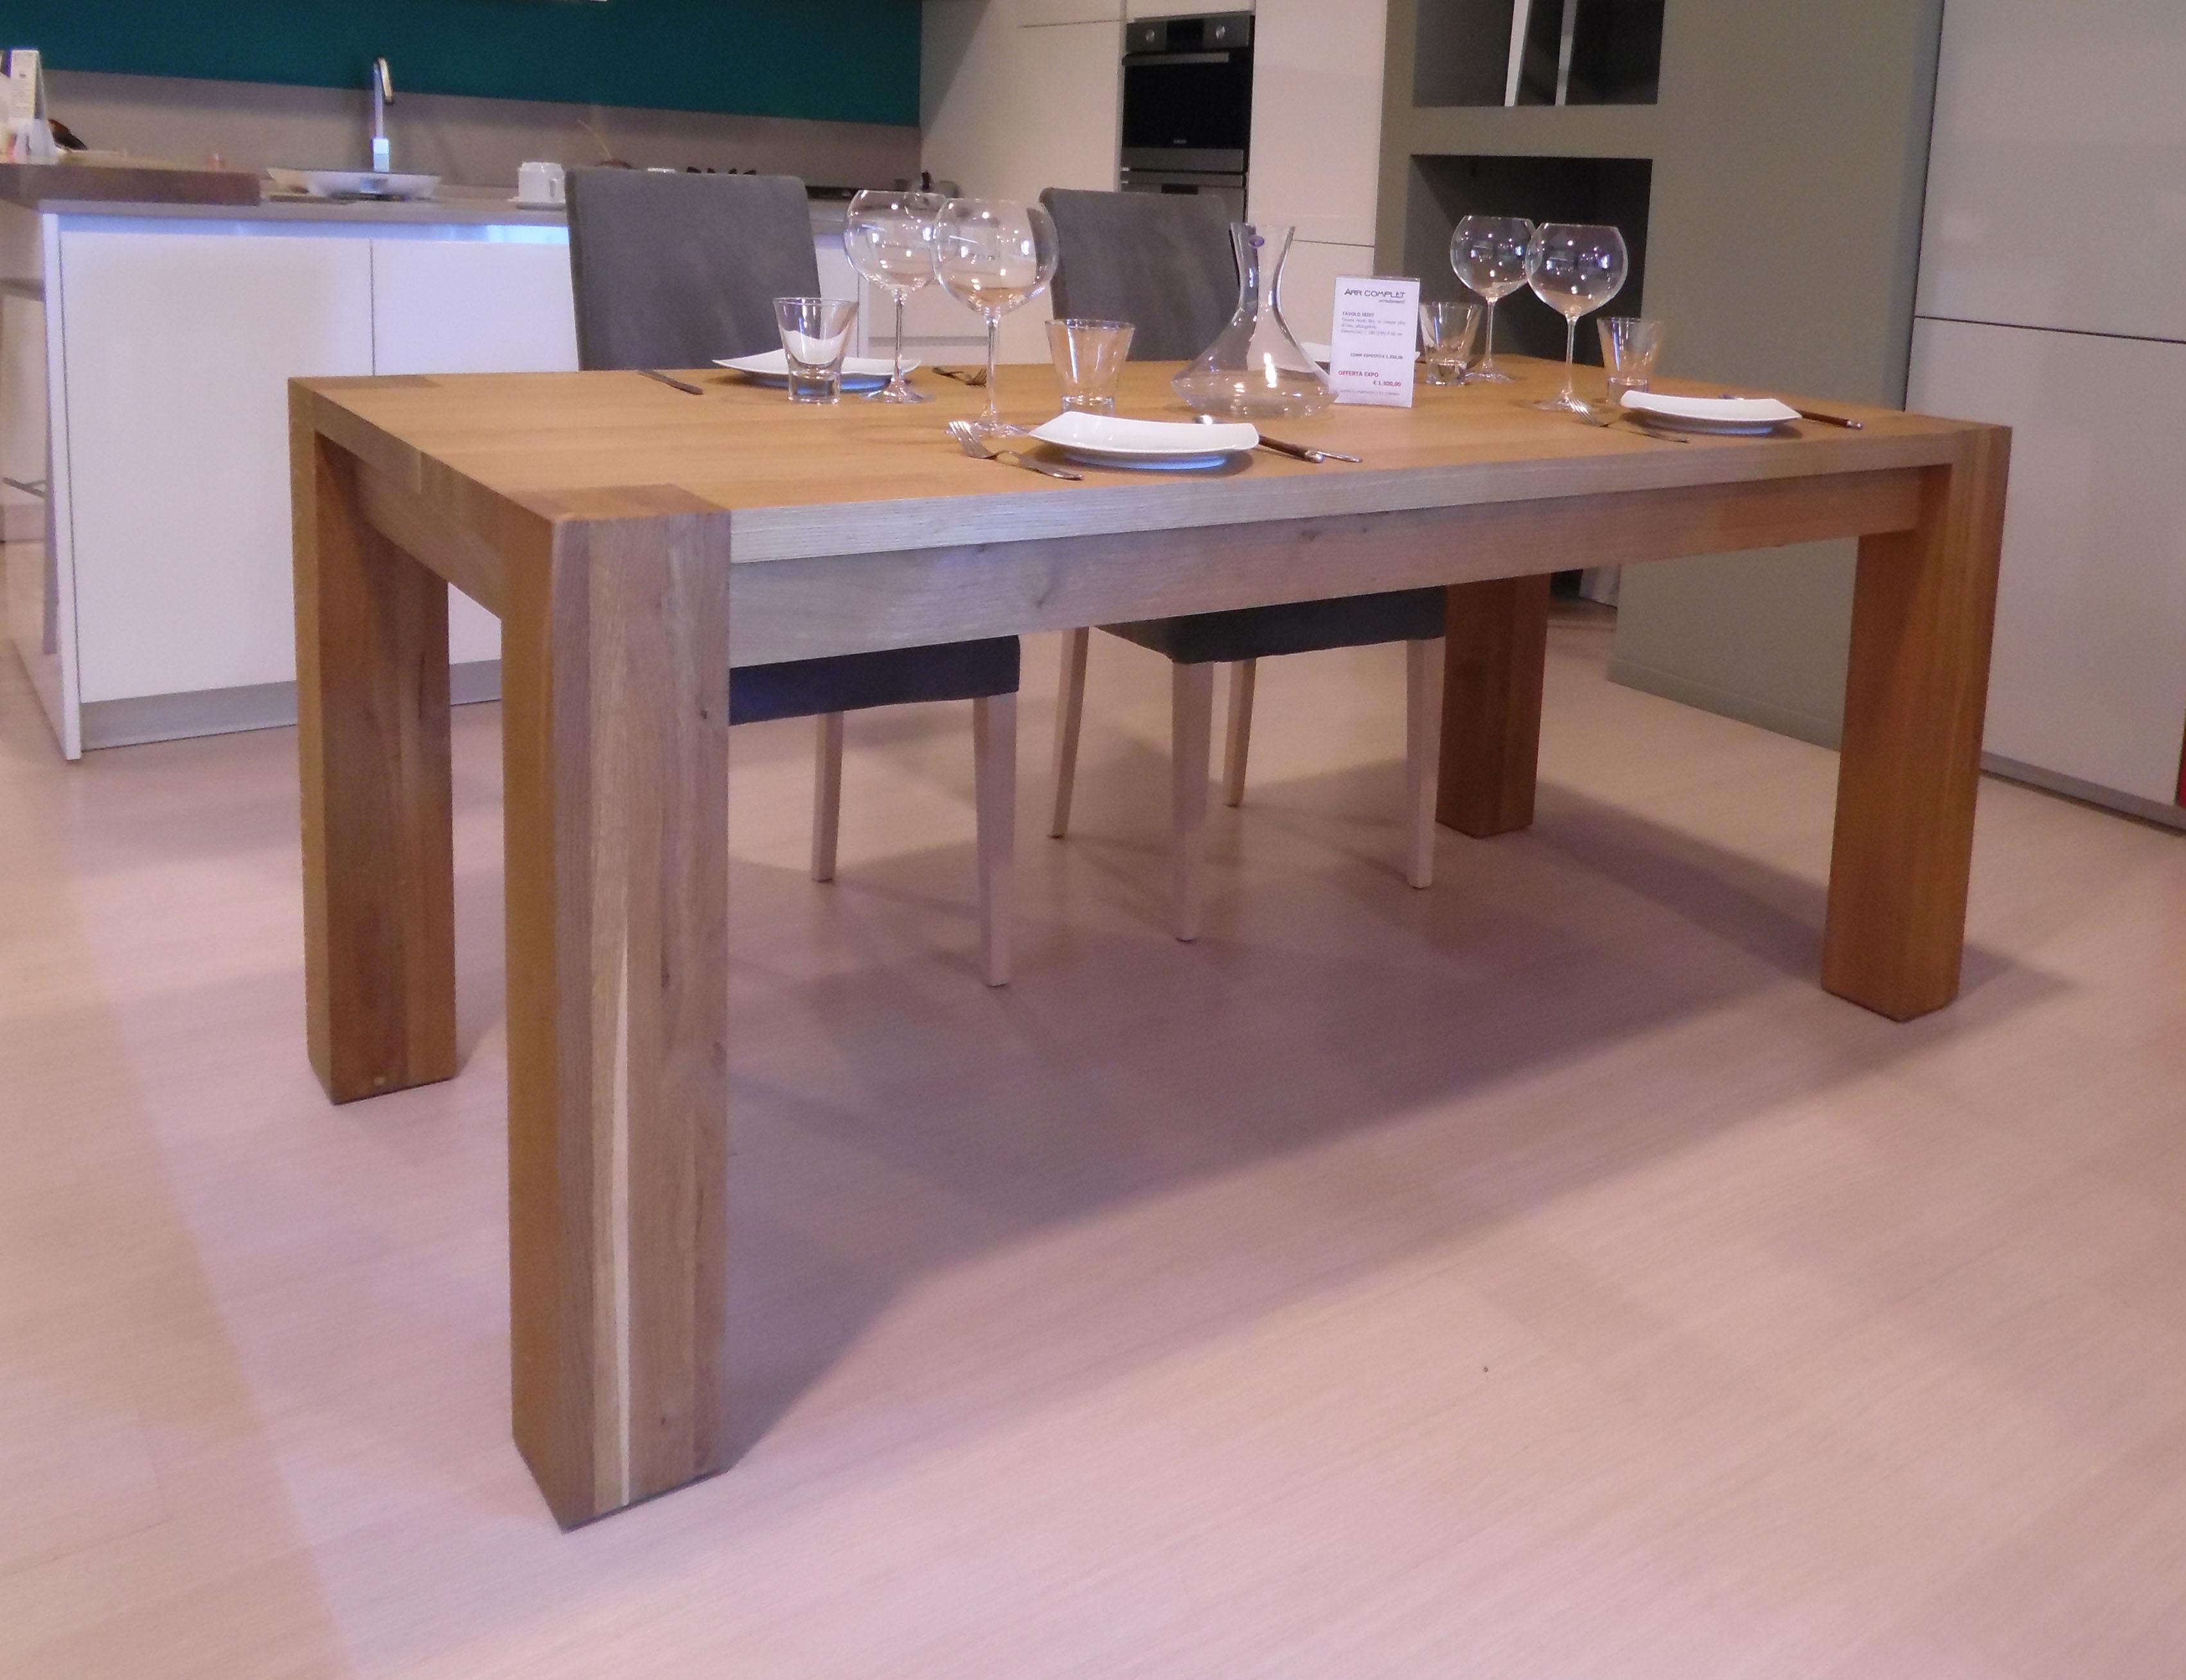 Tavolo sedit bio 180 x 90 rettangolari allungabili for Tavoli rettangolari allungabili in legno